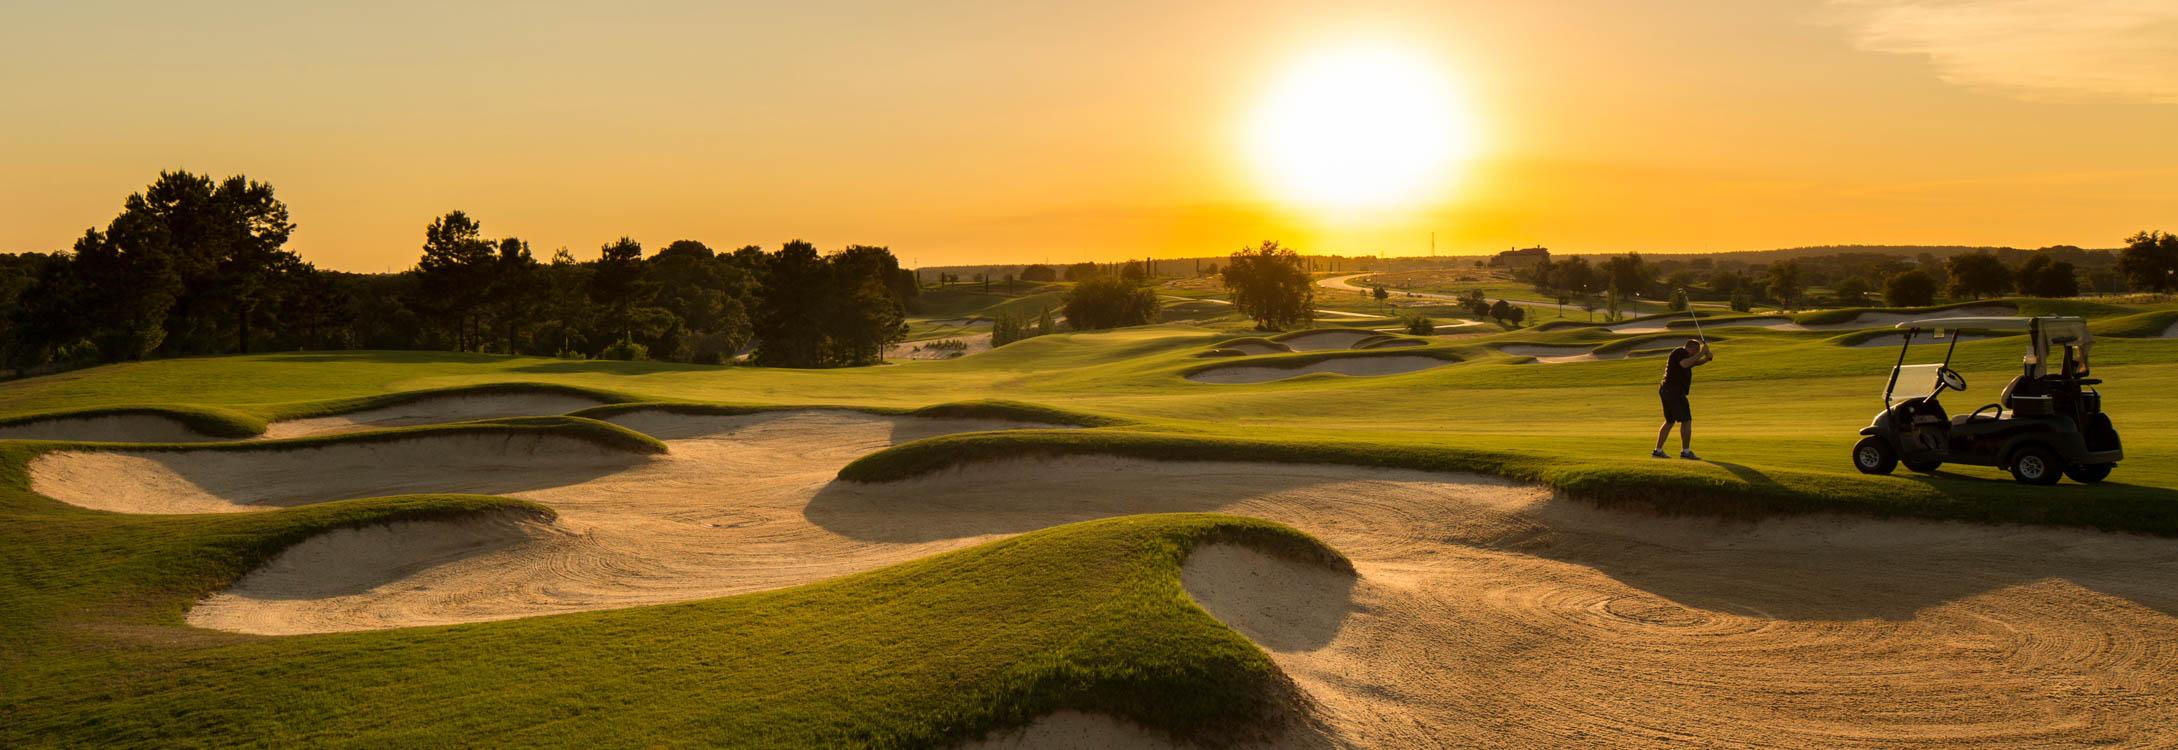 Bella Collina Golf Course Sunset